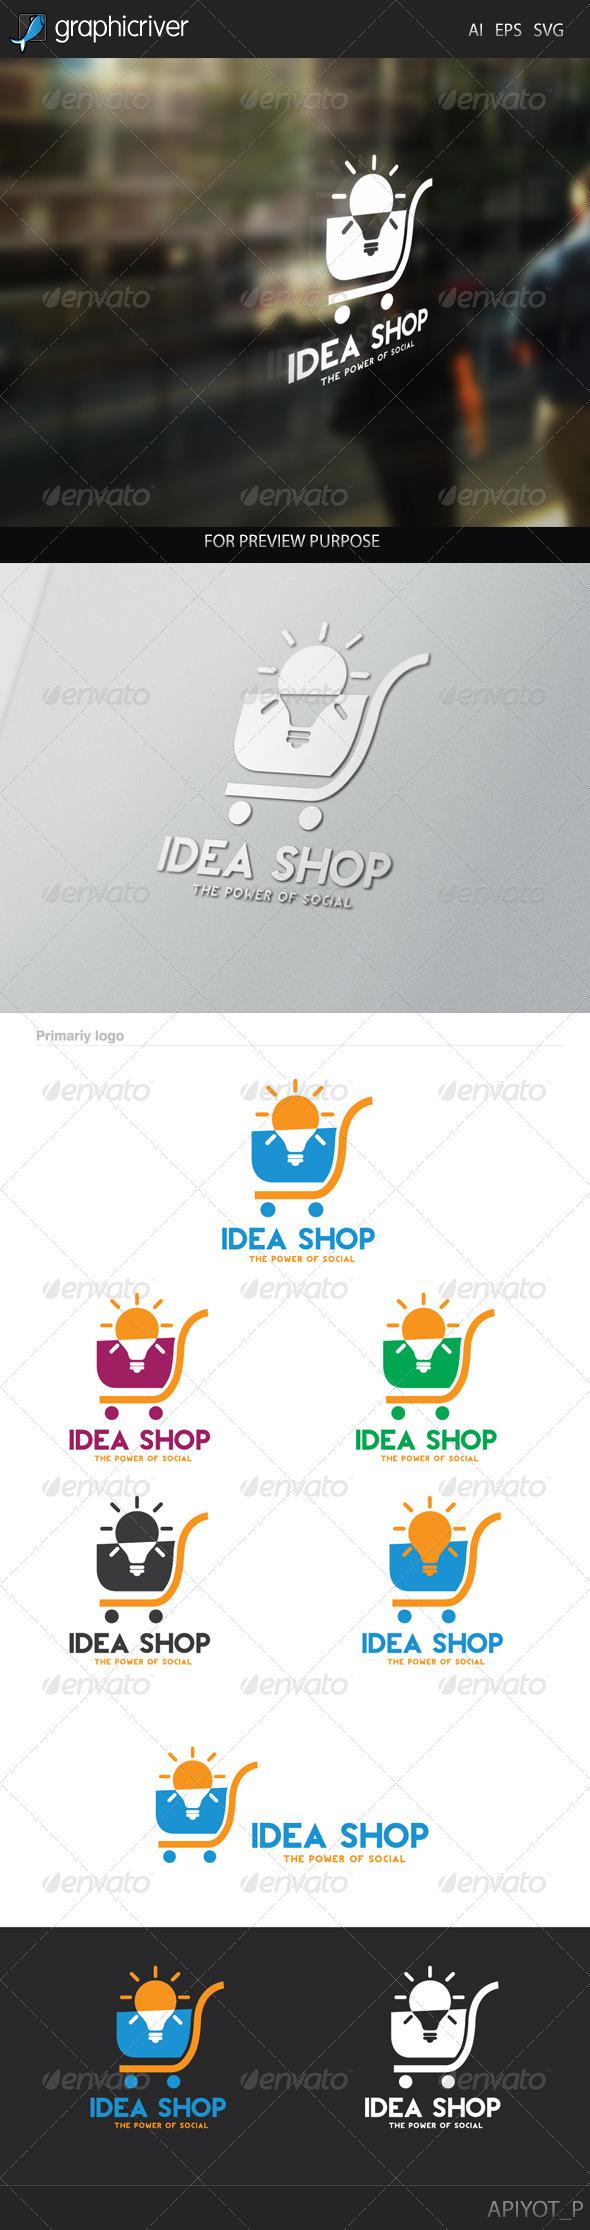 GraphicRiver Idea Shop Logo 8241920